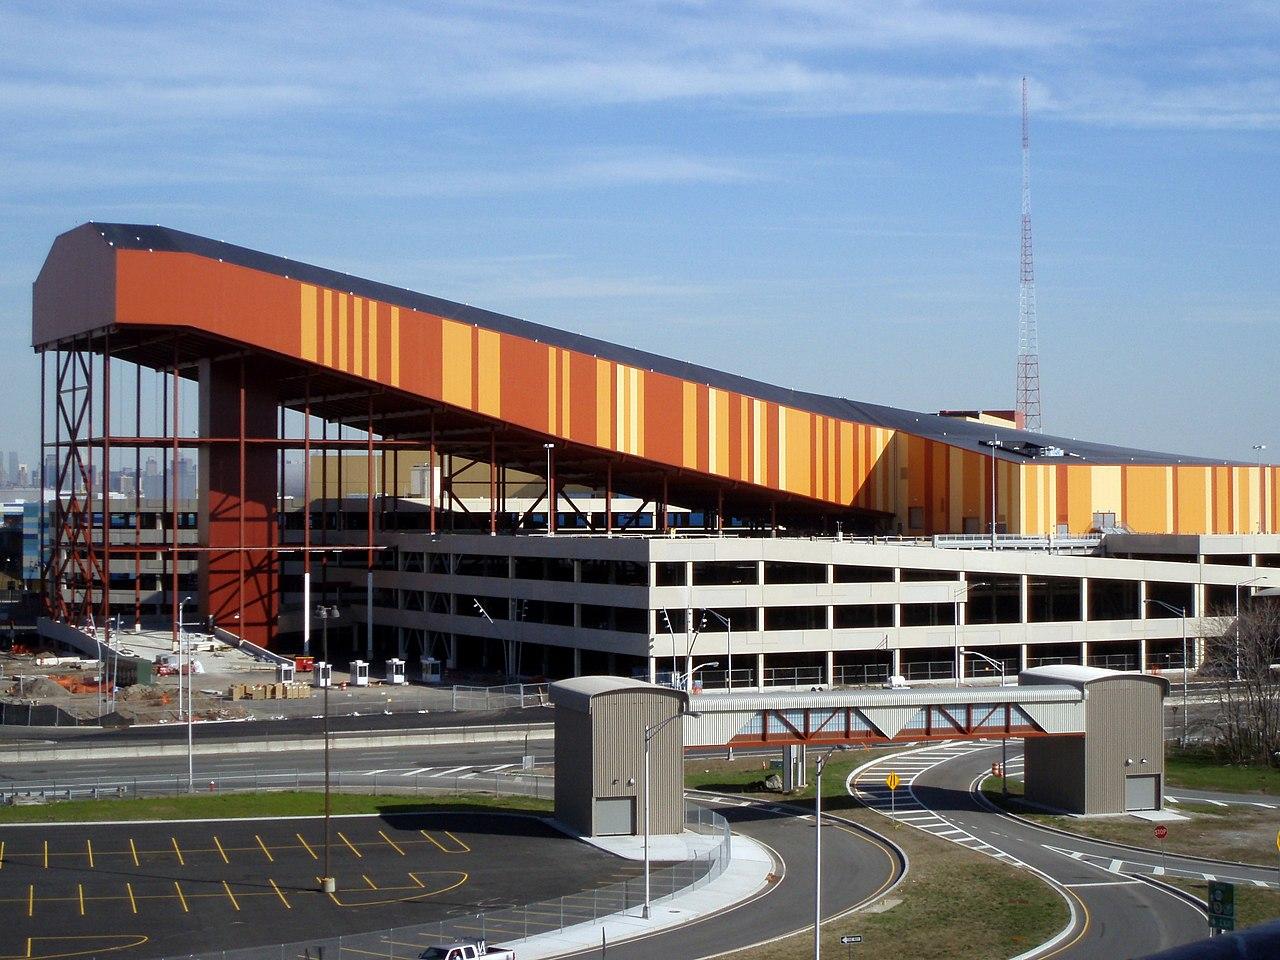 American Dream Mall/Entertainment Complex- Coaster Track On-site